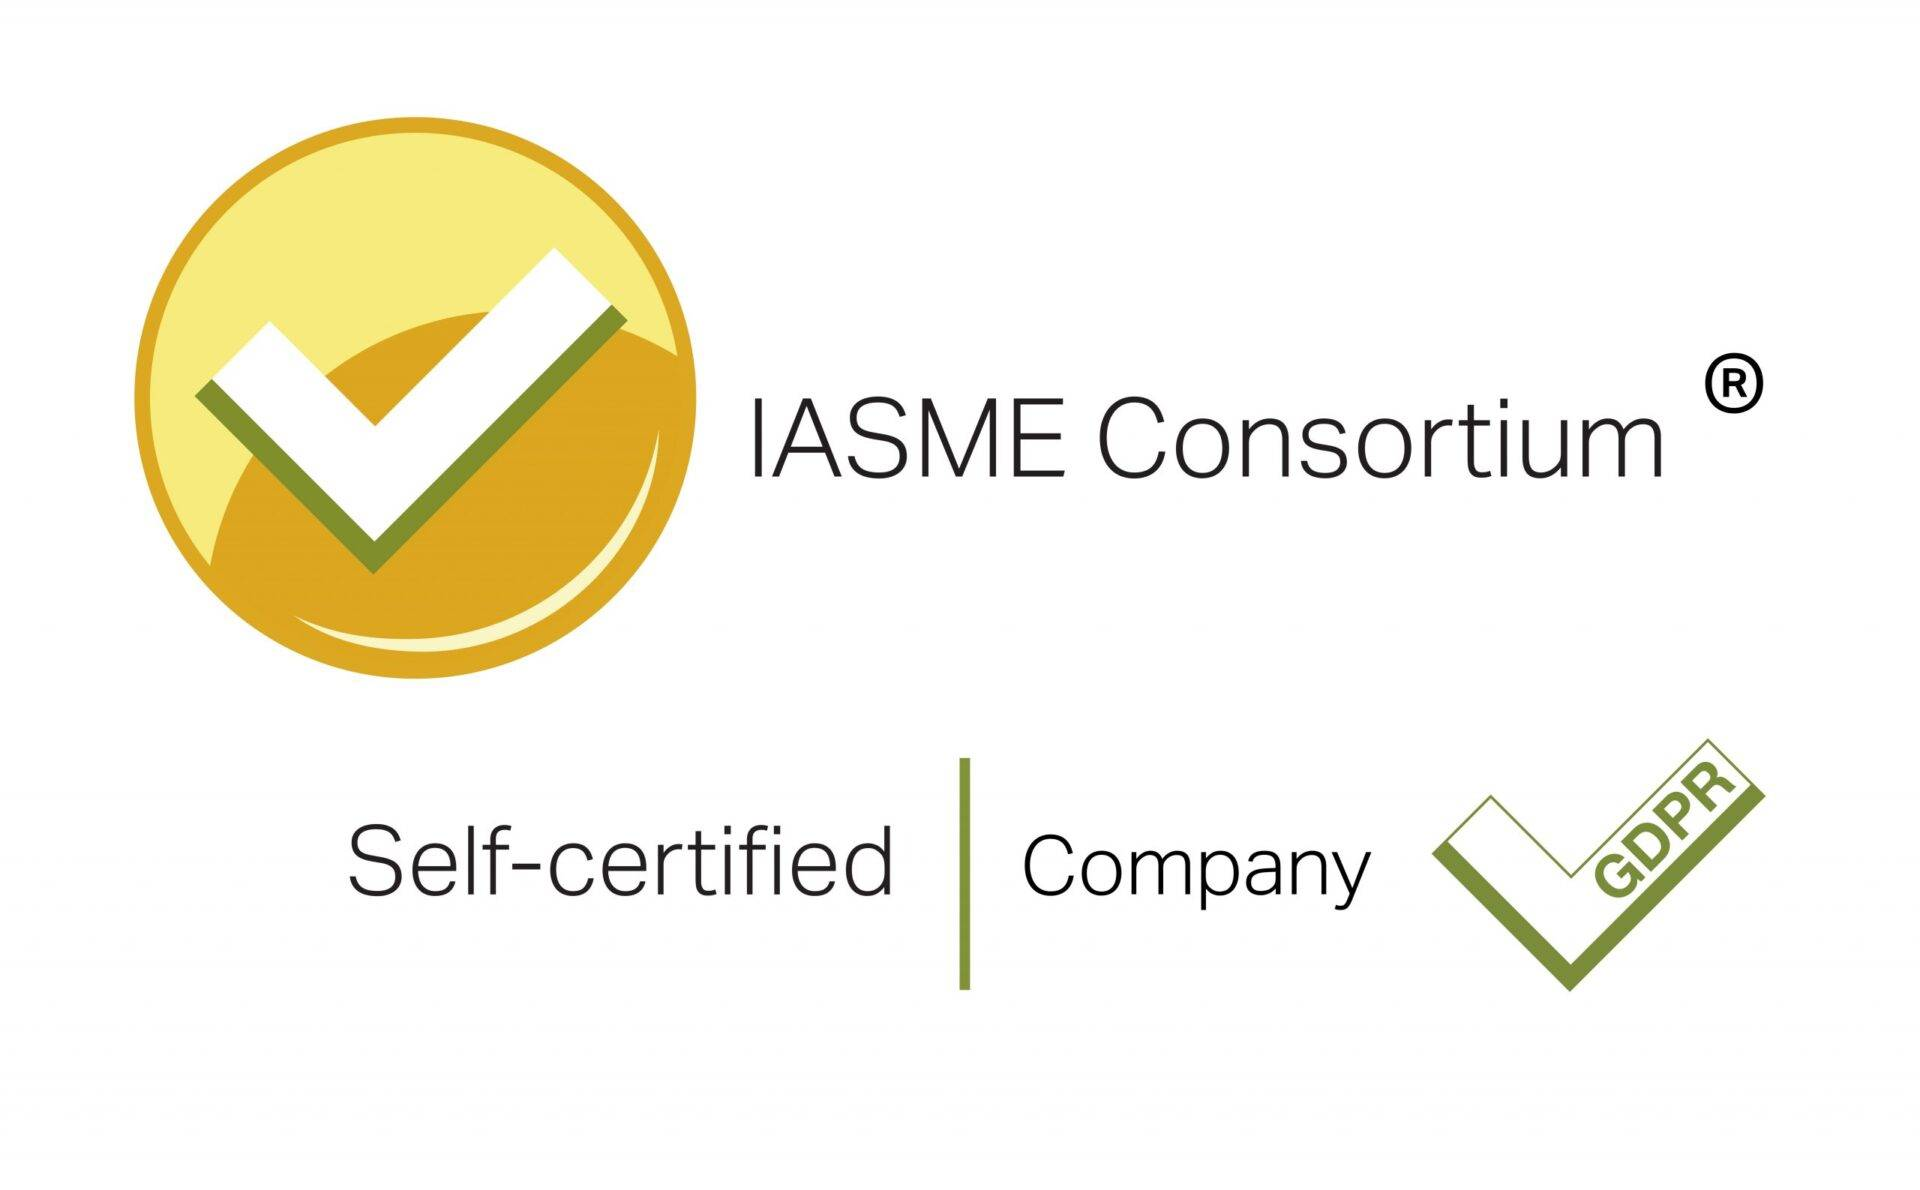 IASMElogo-selfcertified-2017_v3